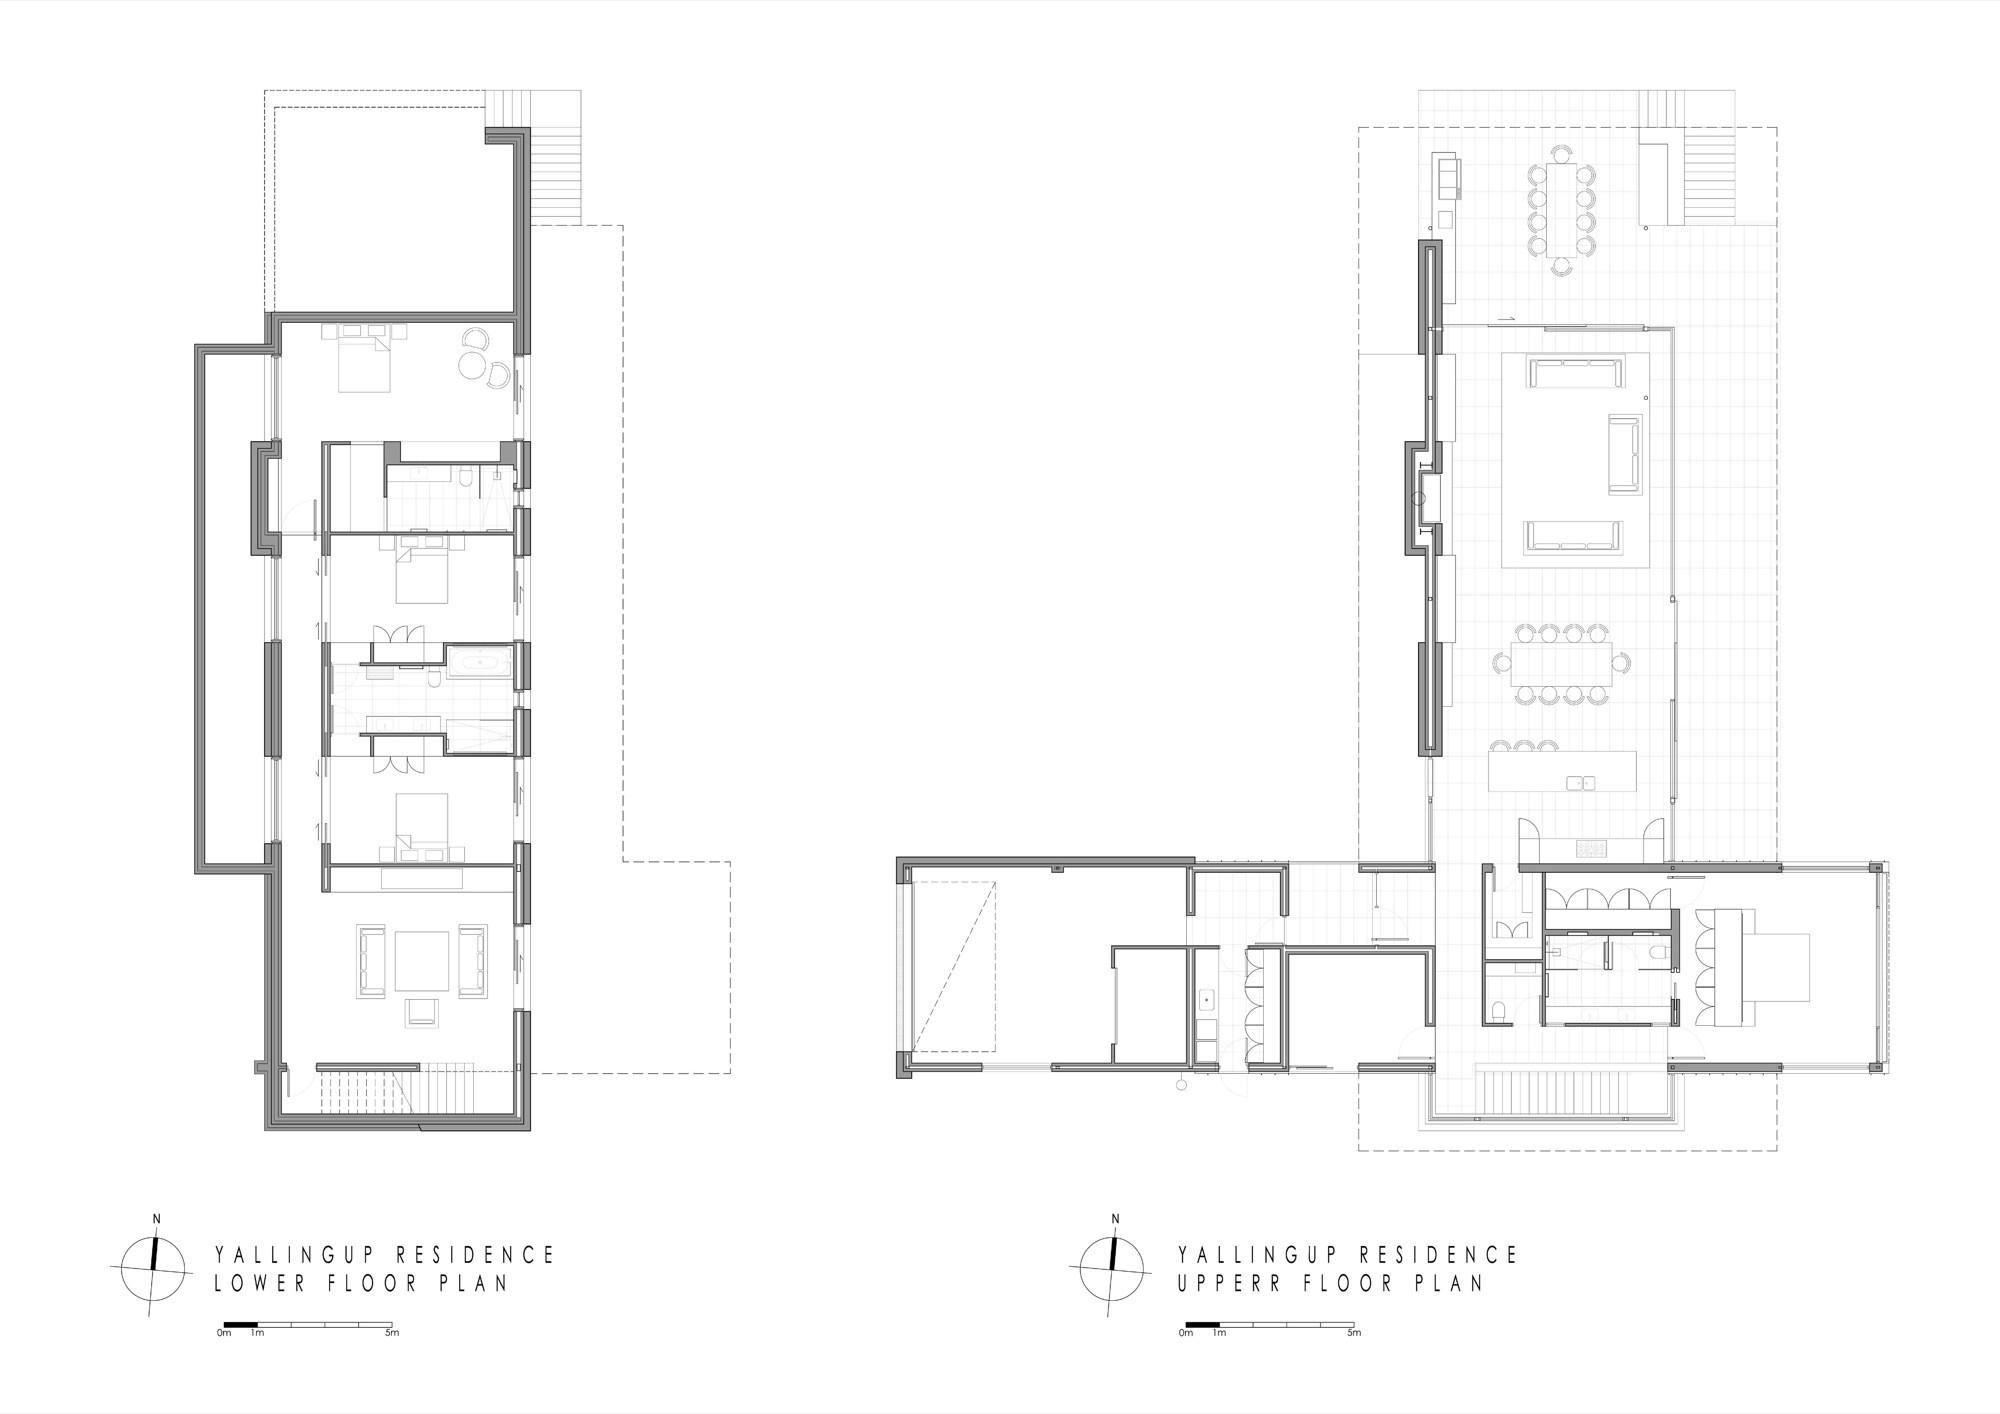 Good Yallingup Residence,Plan Photo Gallery